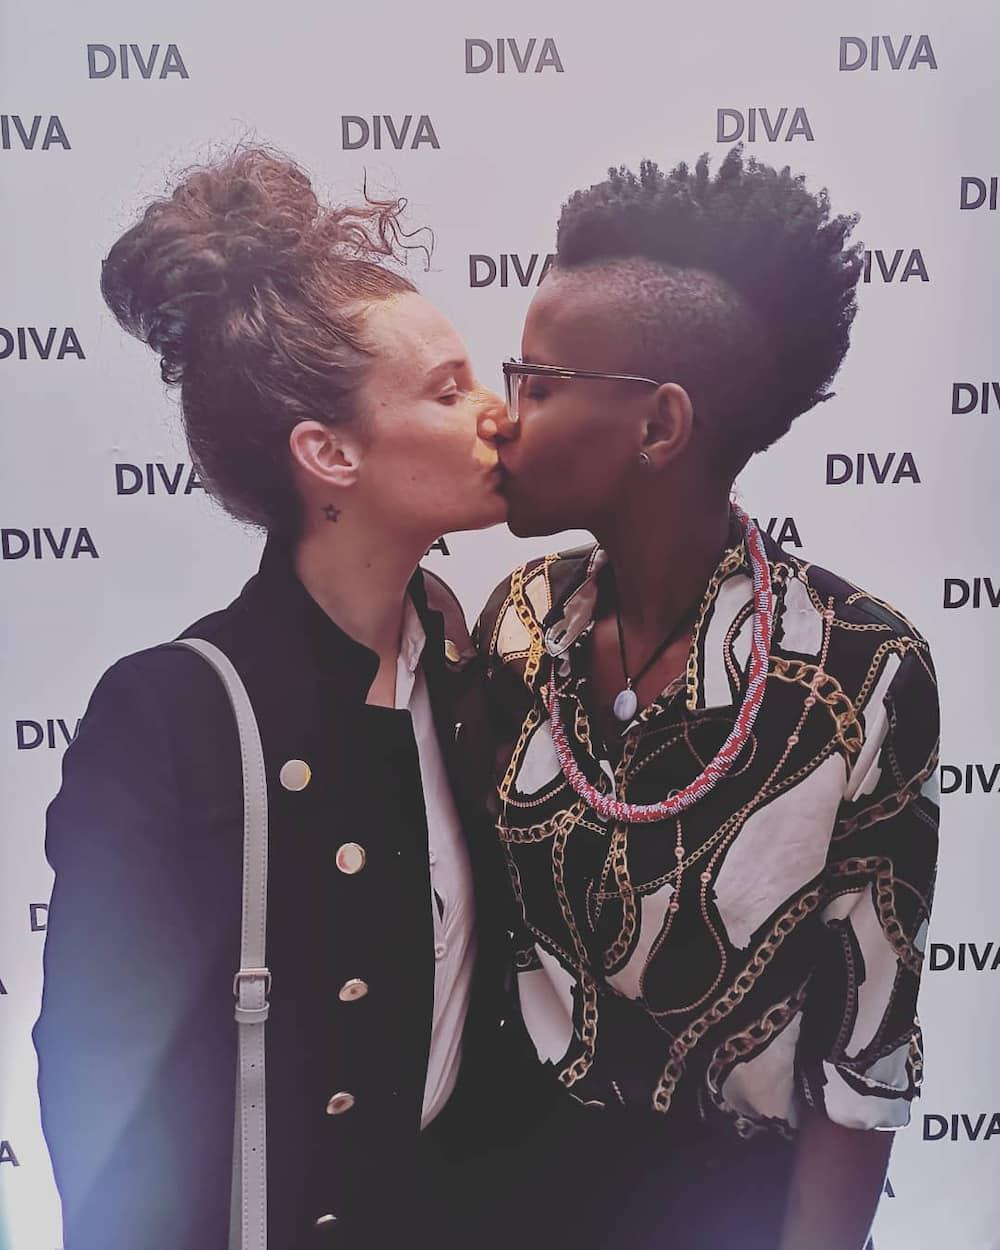 Toya Delazy love is in the air